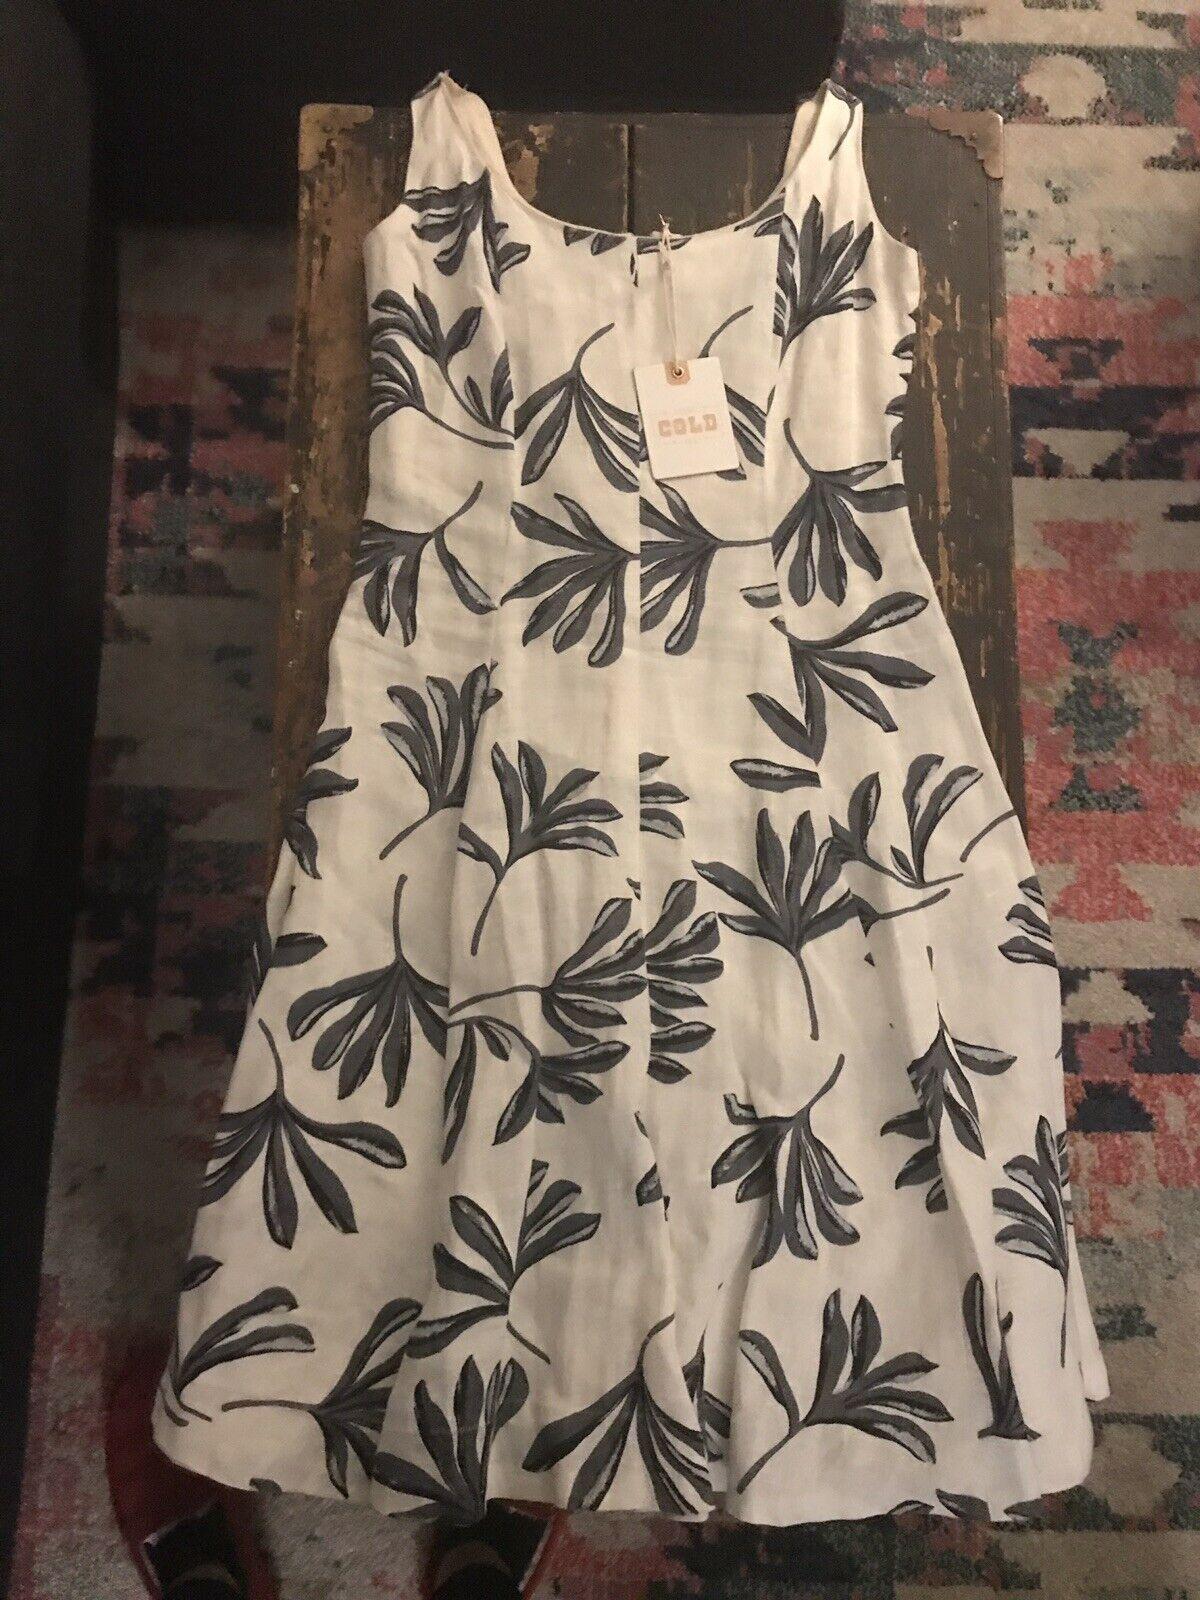 Stone Cold Fox Small Linen Weiß grau Printed Sleeveless A Line Mini Dress